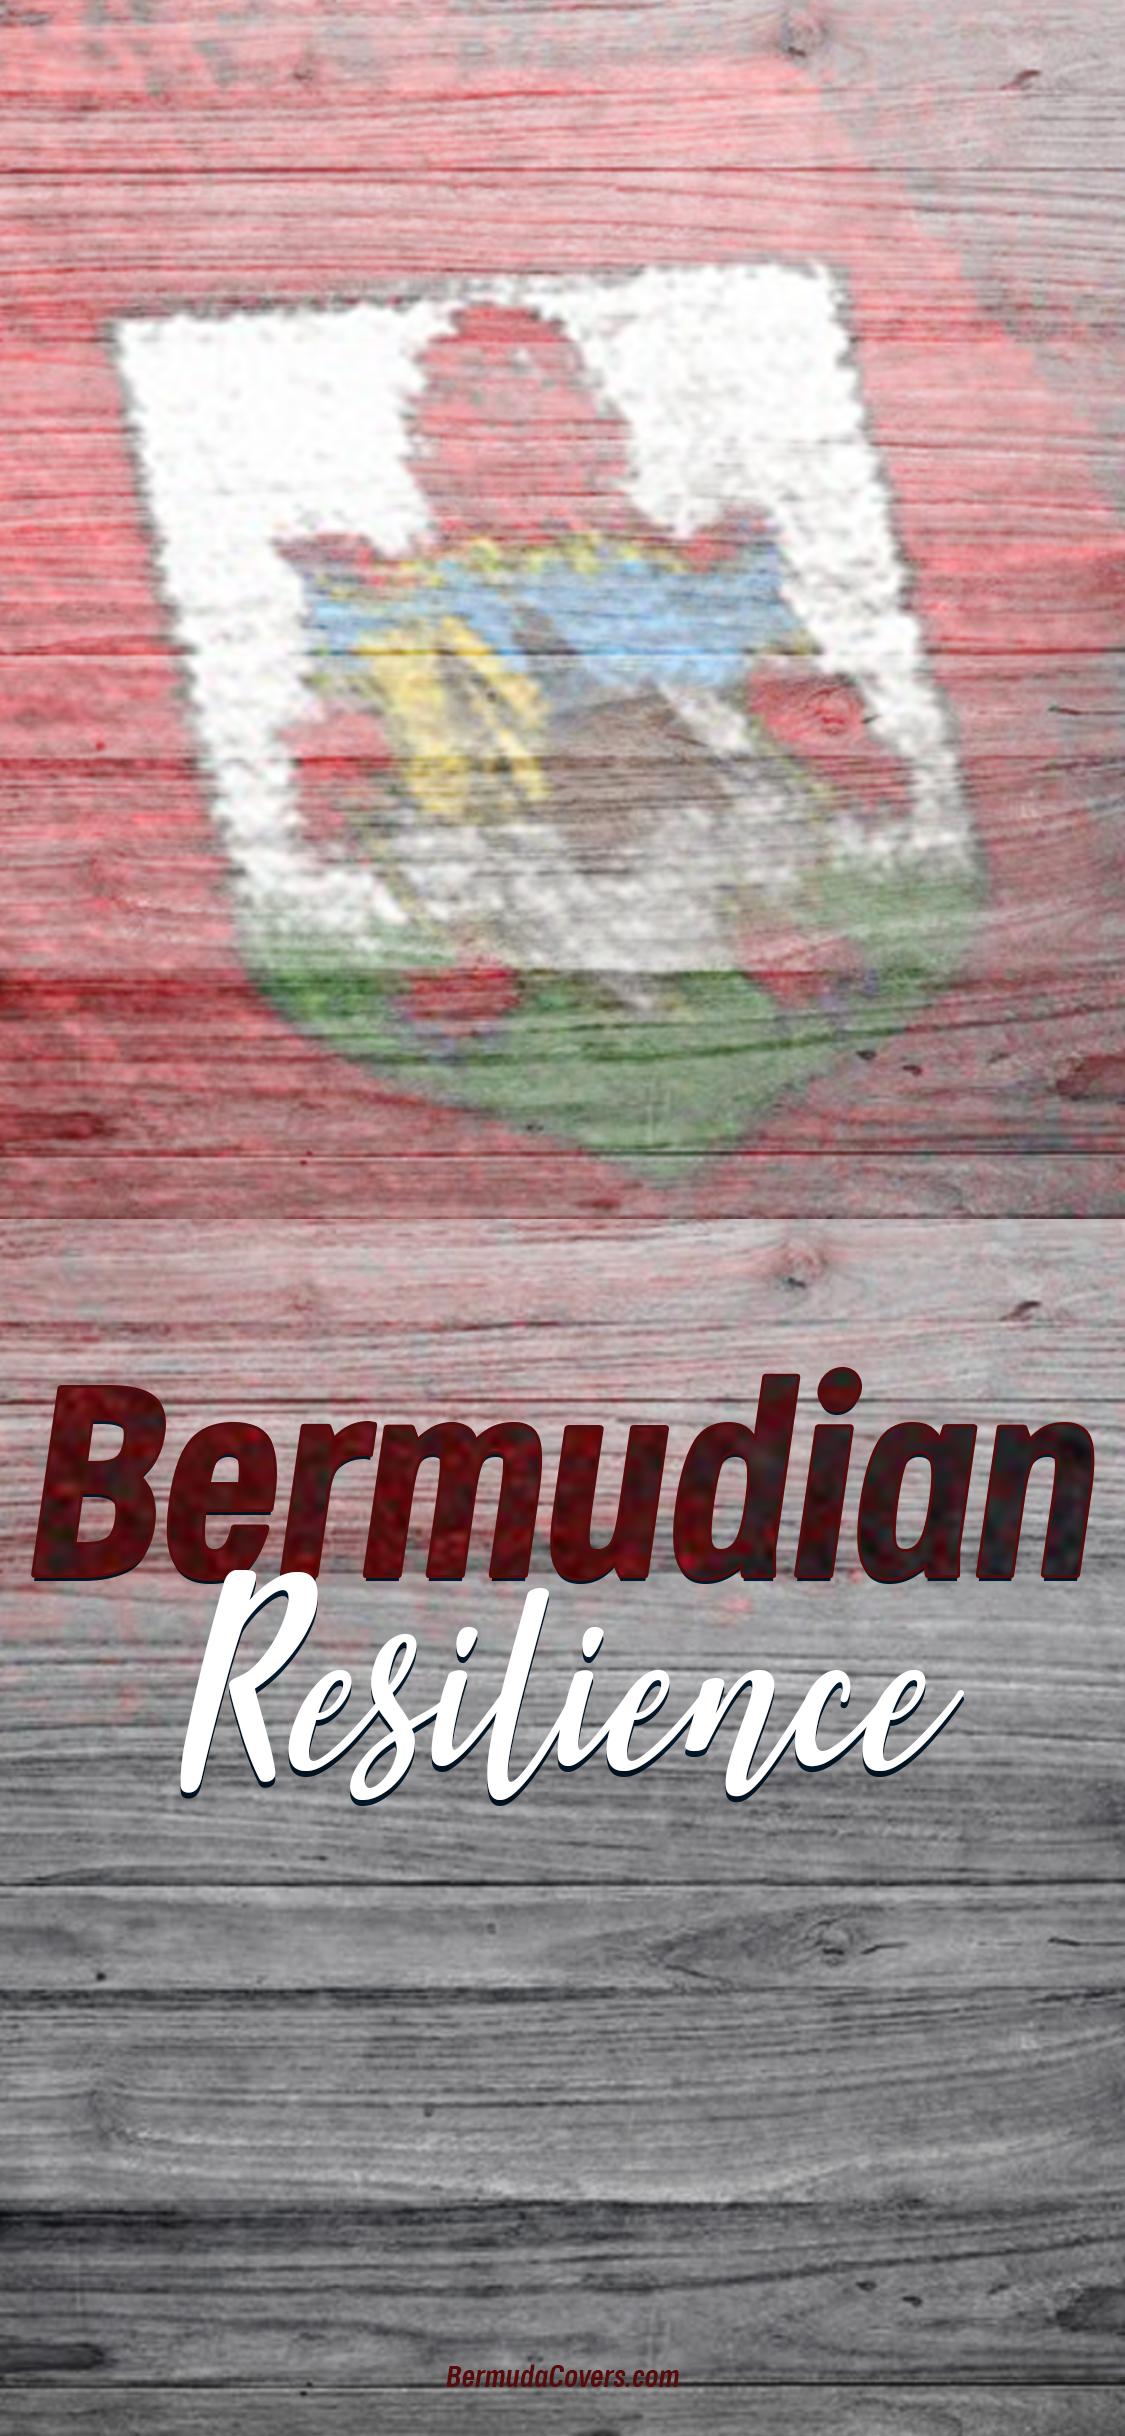 Bermudian-Resilience-Bernews-Mobile-phone-wallpaper-lock-screen-design-image-photo-sjNAXCZW